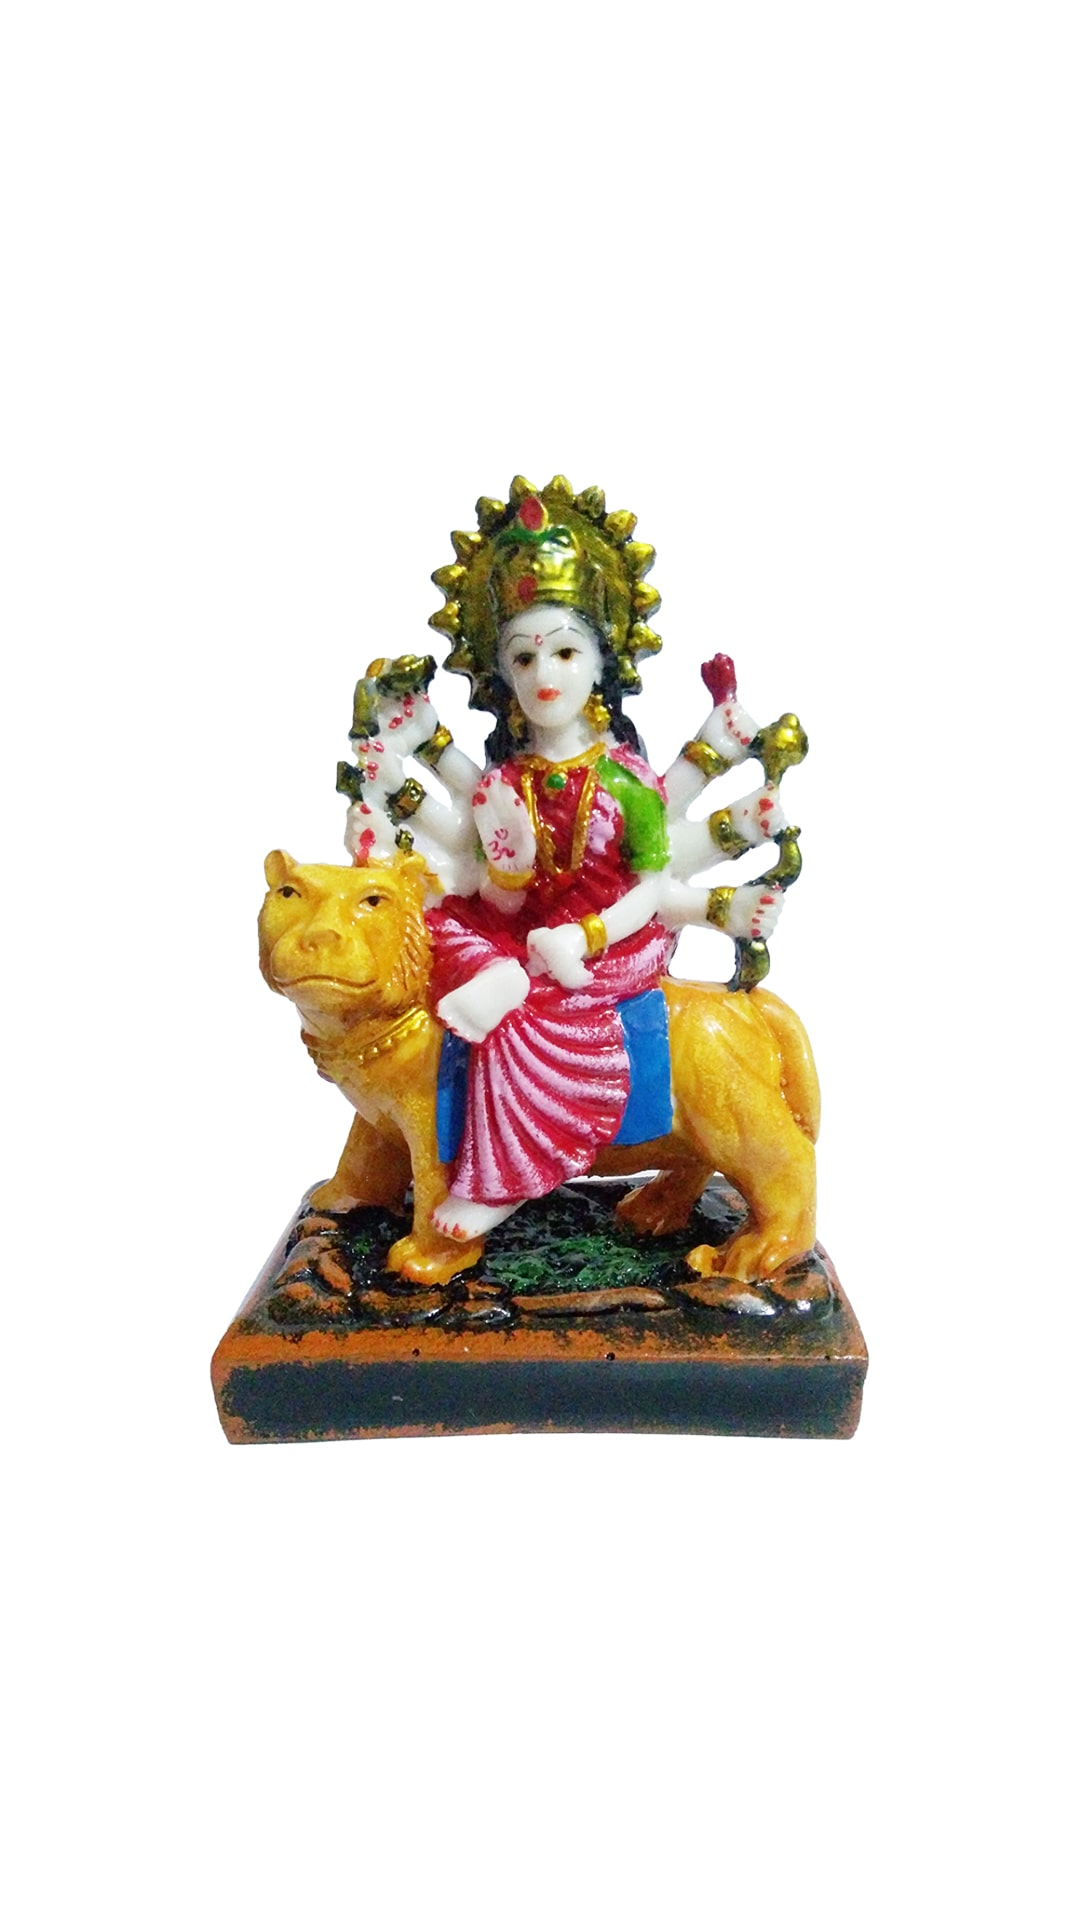 Https assetscdn1 paytm com images catalog product religious goddess maa durga mata sherawali